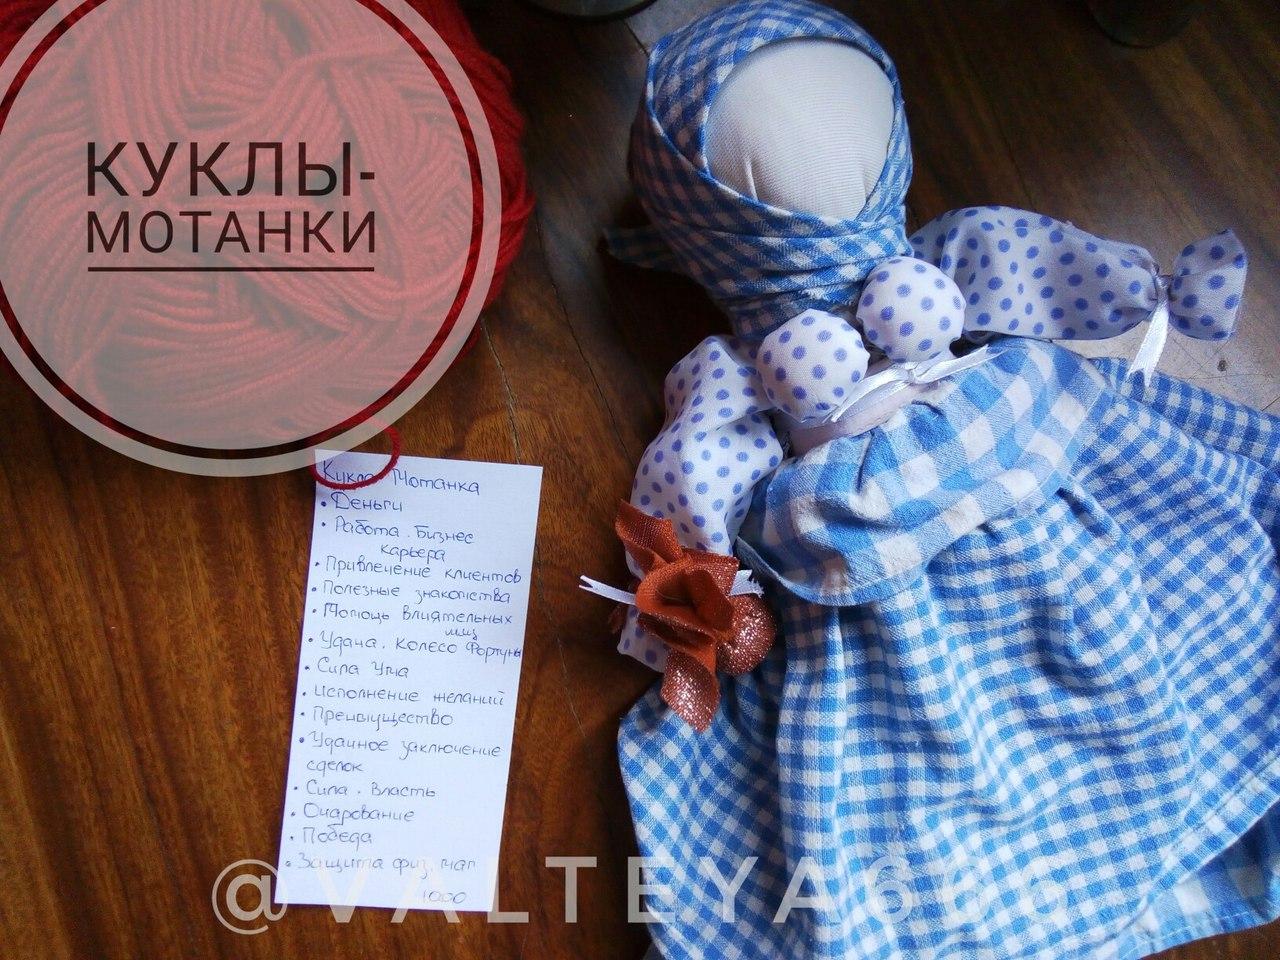 Славянские амулеты-талисманы Куклы-мотанки LBCDzG-4_-A